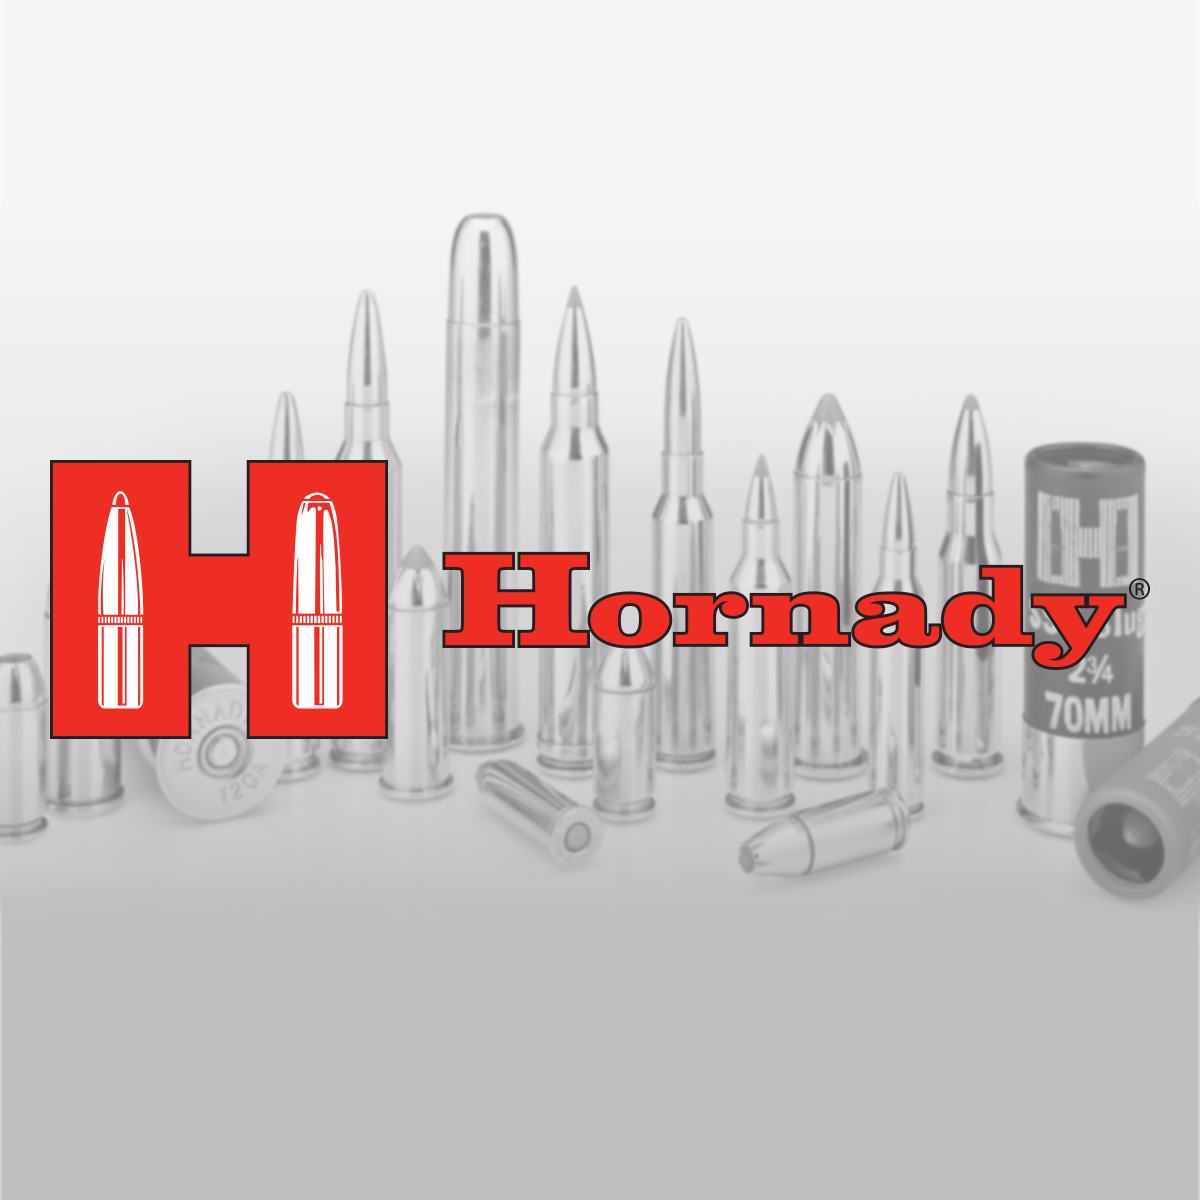 www.hornady.com